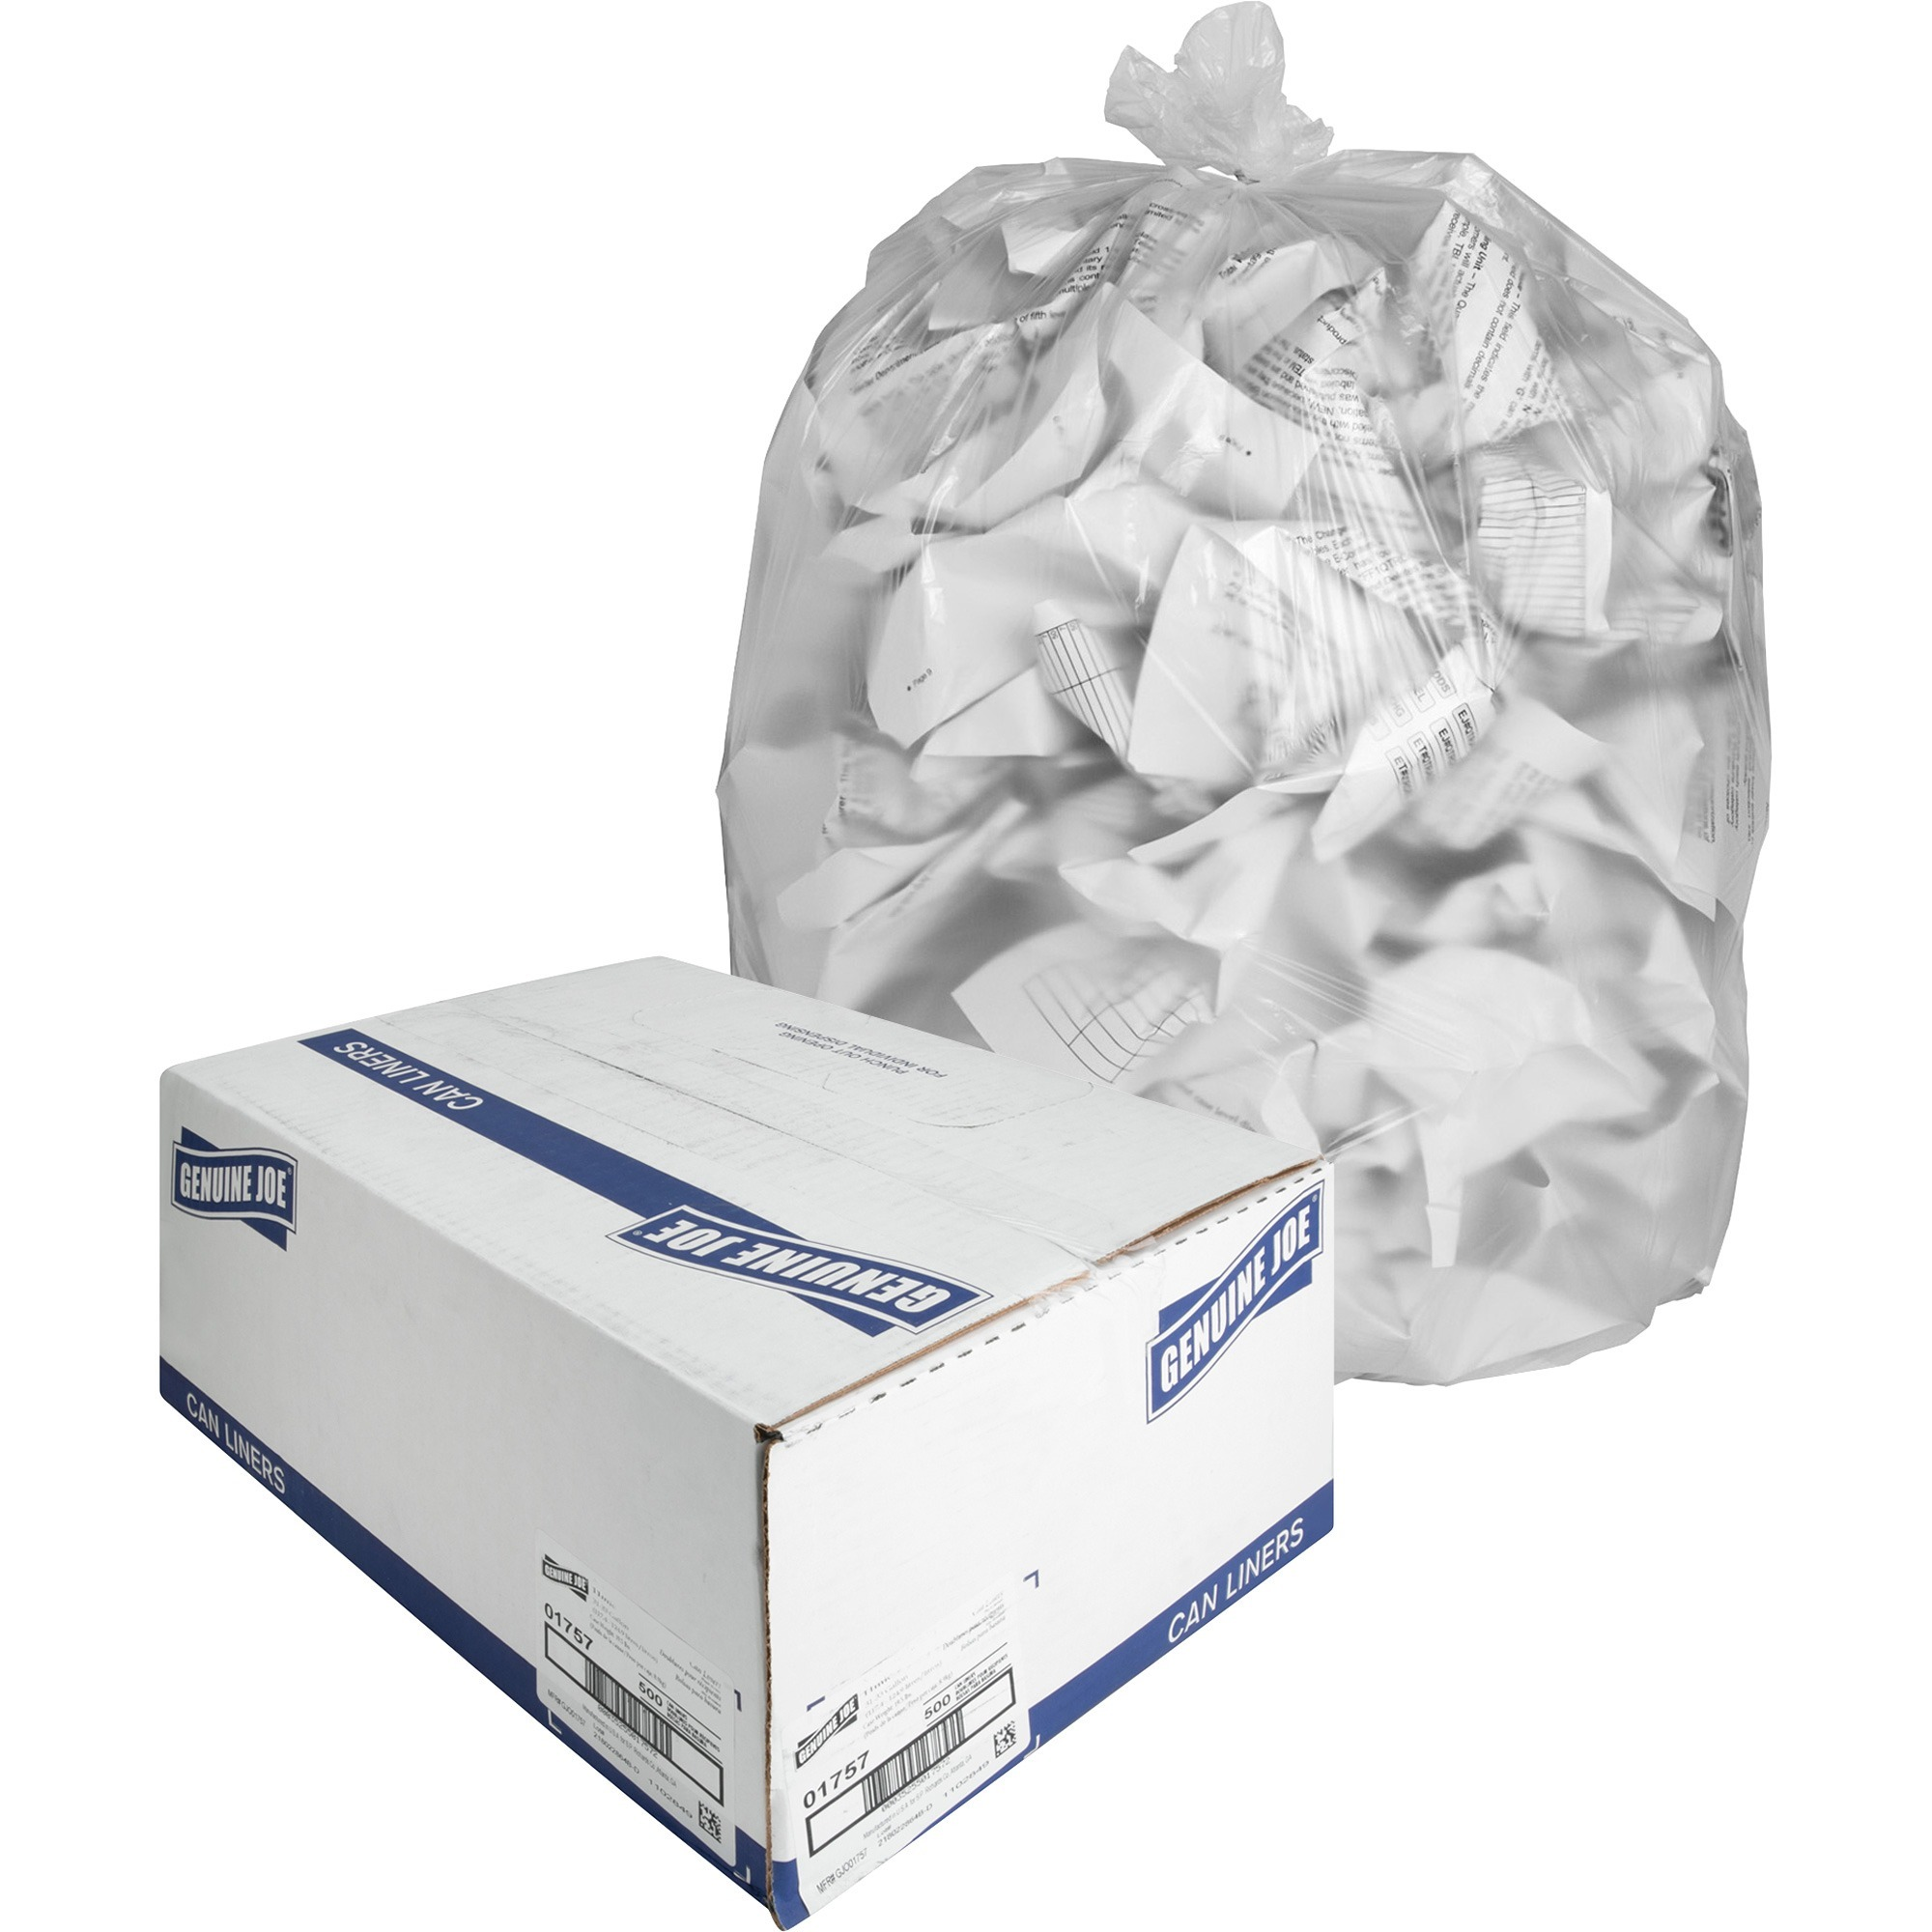 Genuine Joe, GJO01757, High-density Can Liners, 500 / Carton, Clear, 33 gal